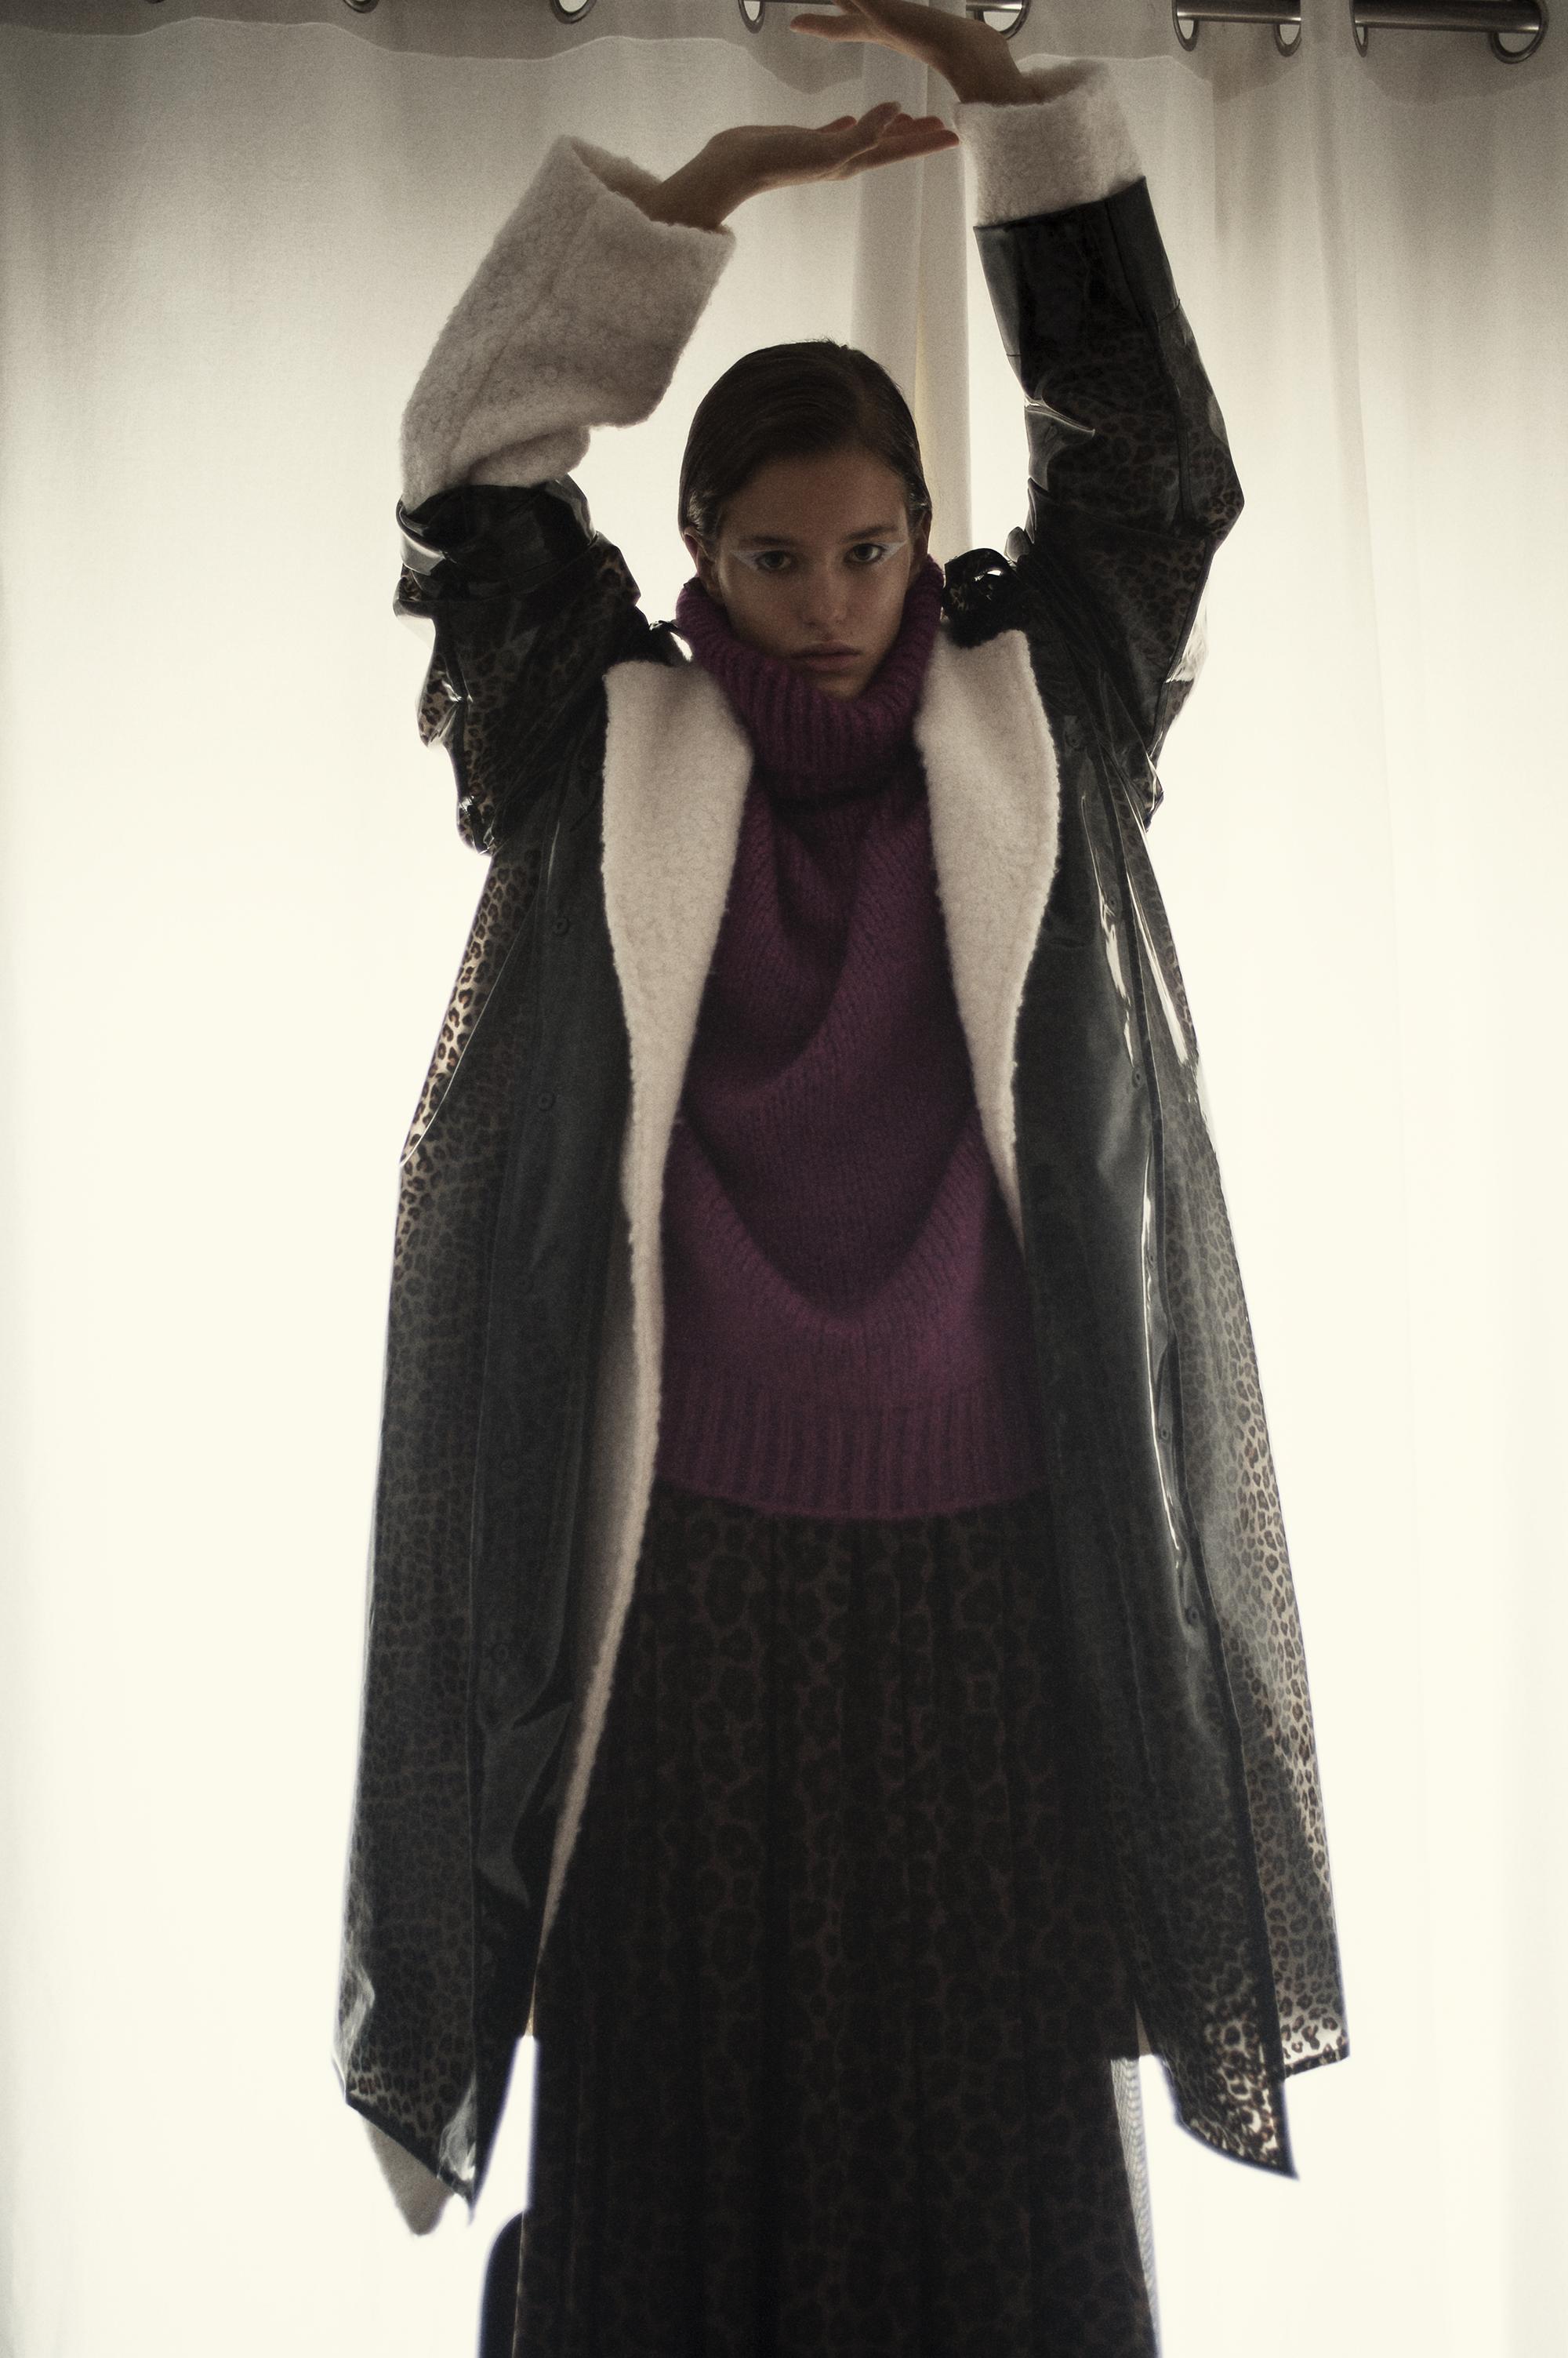 Leopard anorak  Ganni . Sheep skin coat  Acne Studios . Purple jumper  Hugo   Boss.  Leopard dress  Just Cavali    Filippos Hatzis, www.filipposhatzis.co.uk @filipposhatzis. Stylist, Yiorgos Mesimeris @yiorgosmesimeris. Make up, Christos Theophanous @theophanouschris. Hair, Konstantinos Sakkas - @ksakkas. Model, Taya @ACE models ( Elite Worldwide )